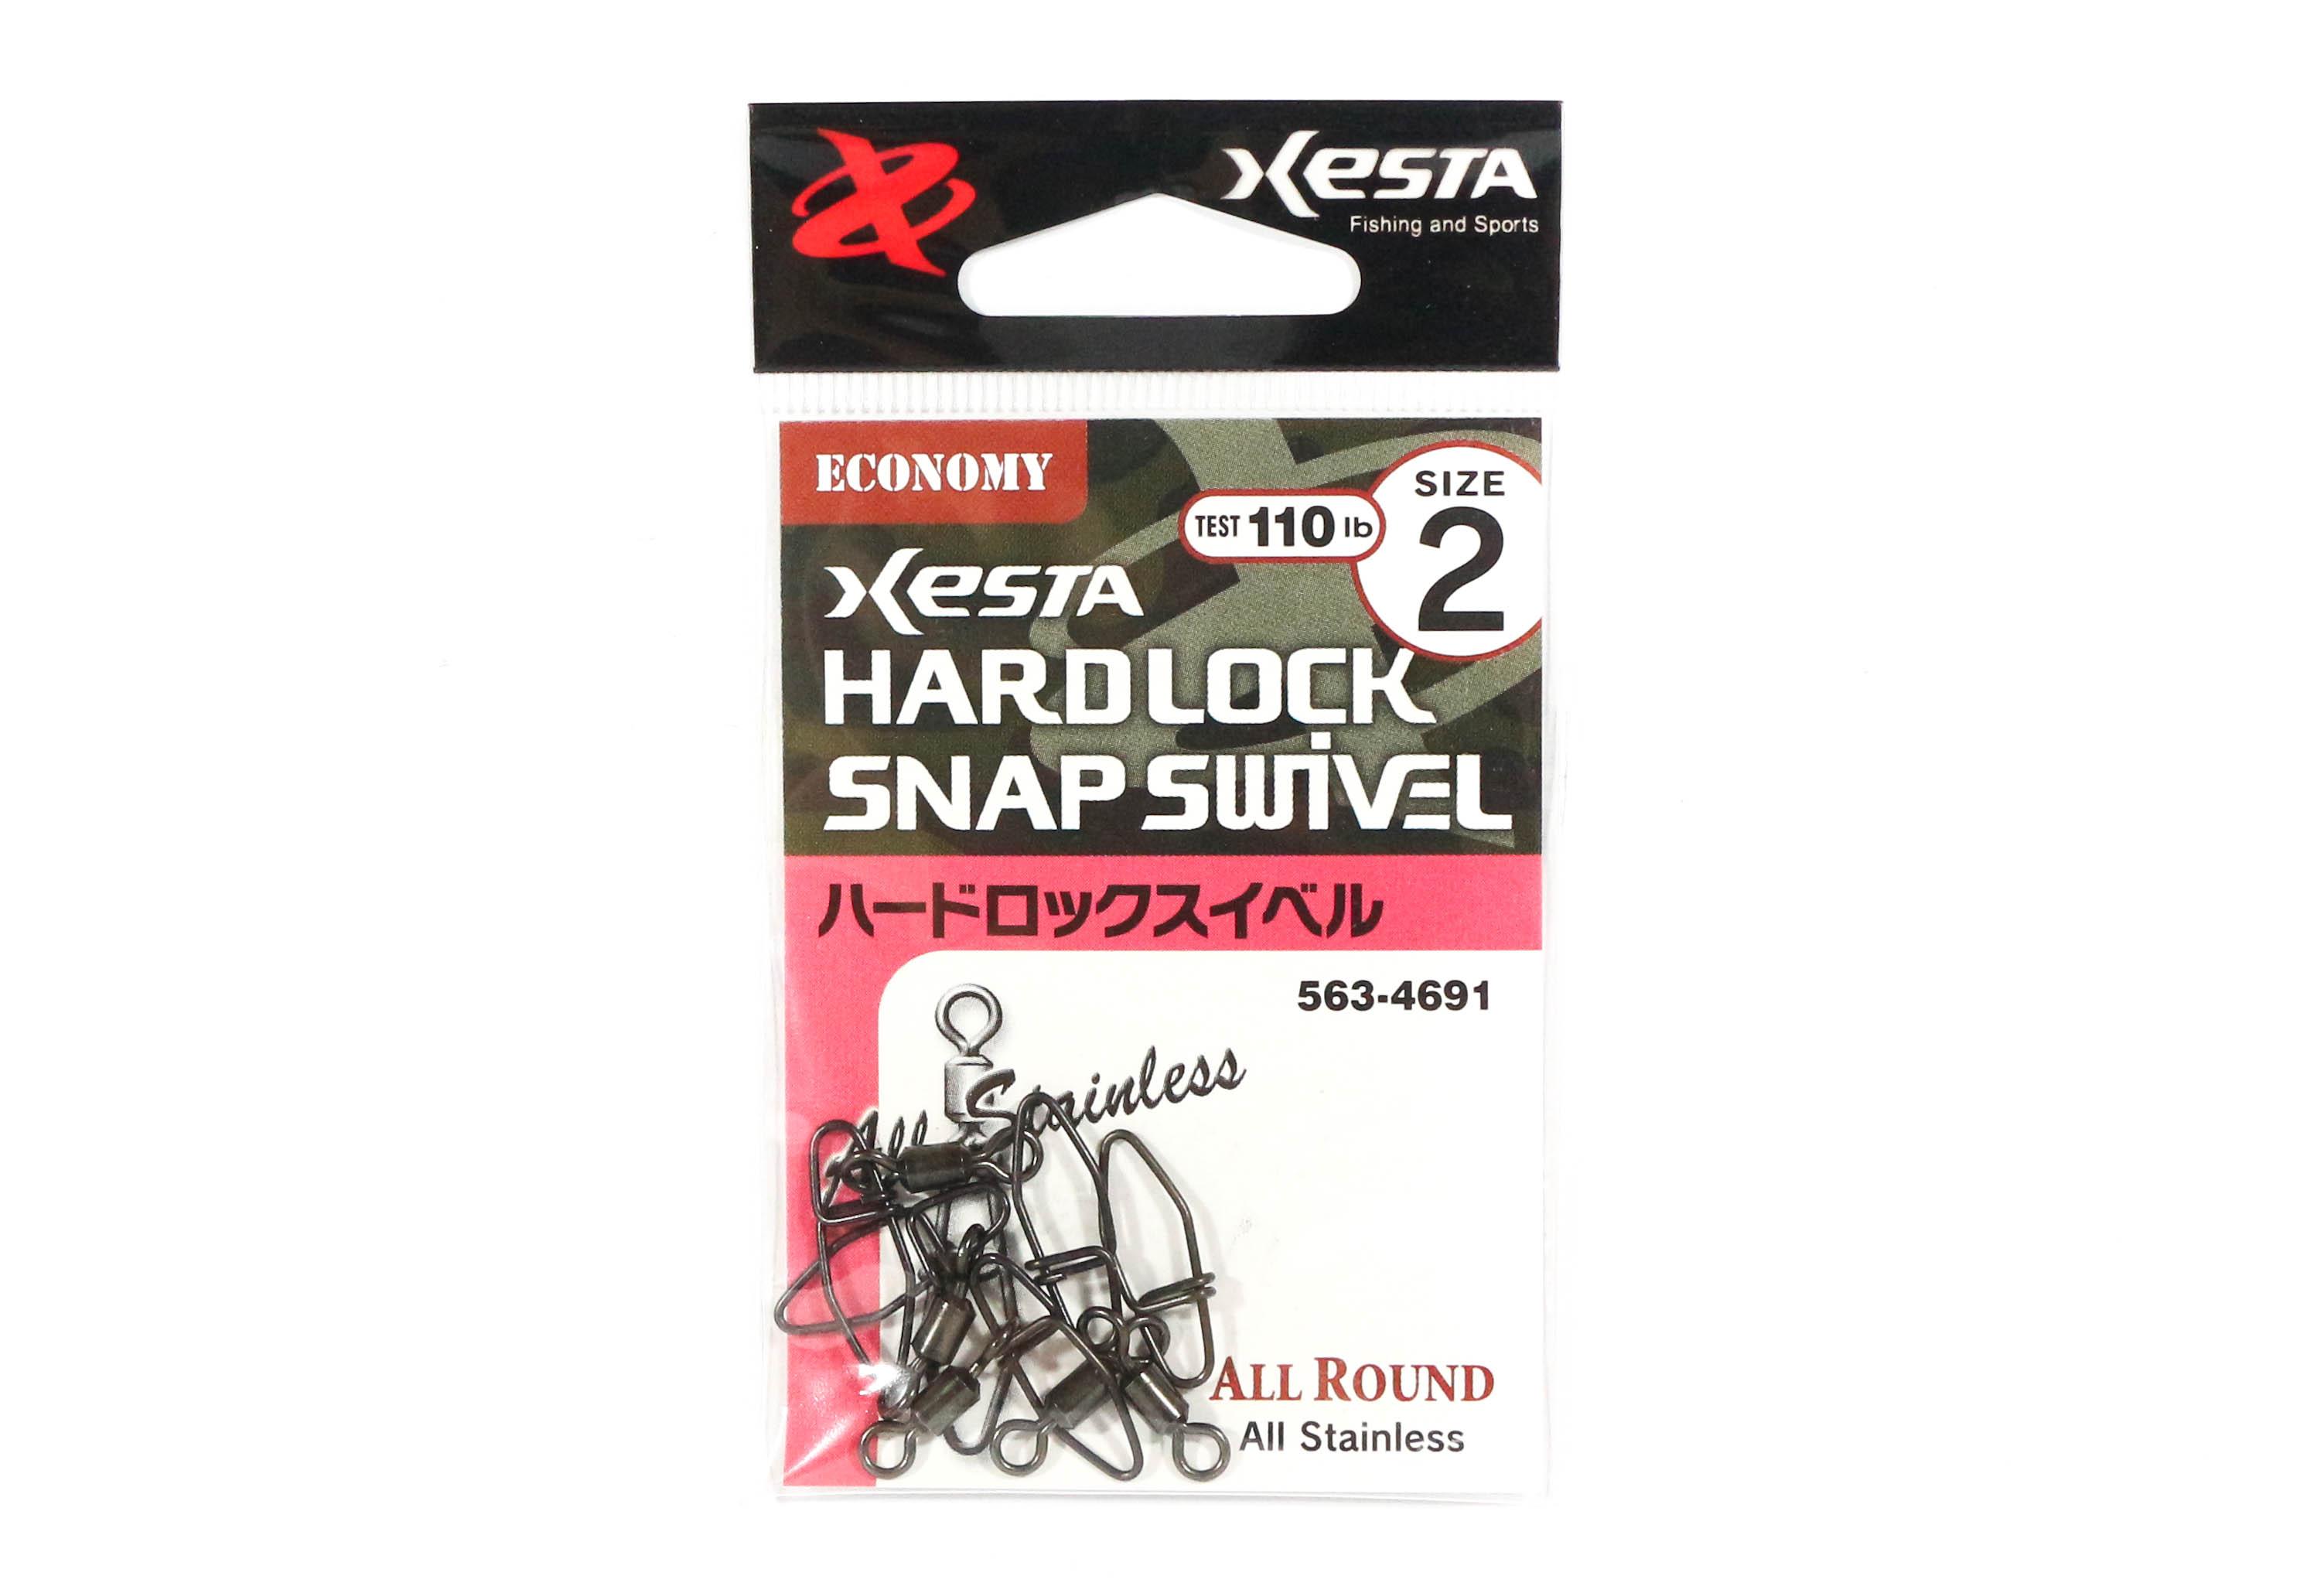 Xesta Hard Lock Snap Swivel Size 2 110 lb , 5 pieces (4691)